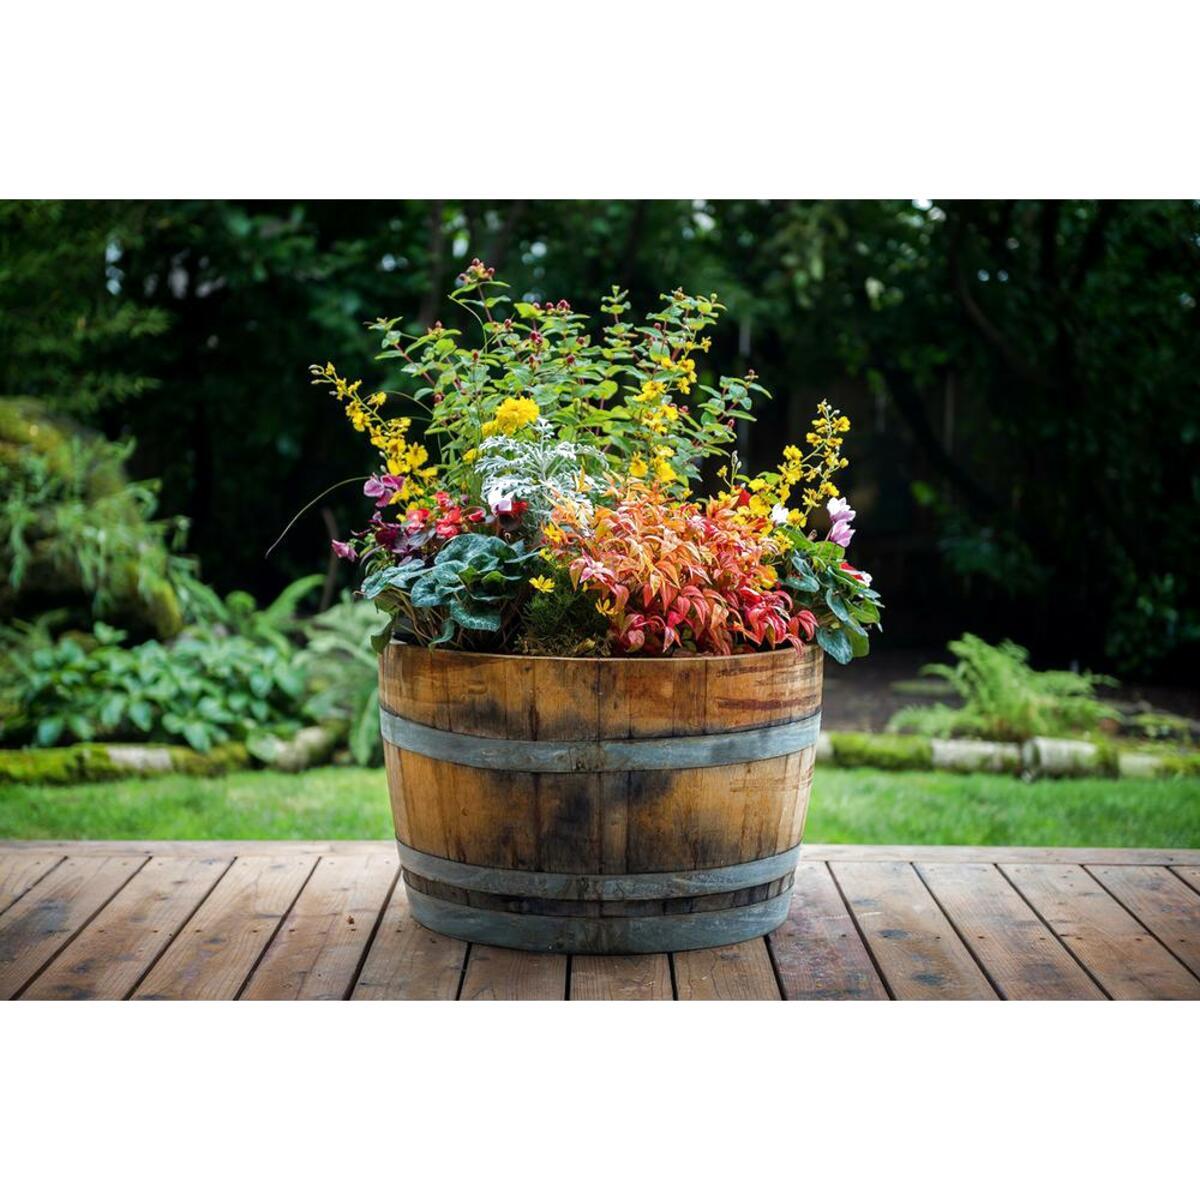 oak barrel planters for sale